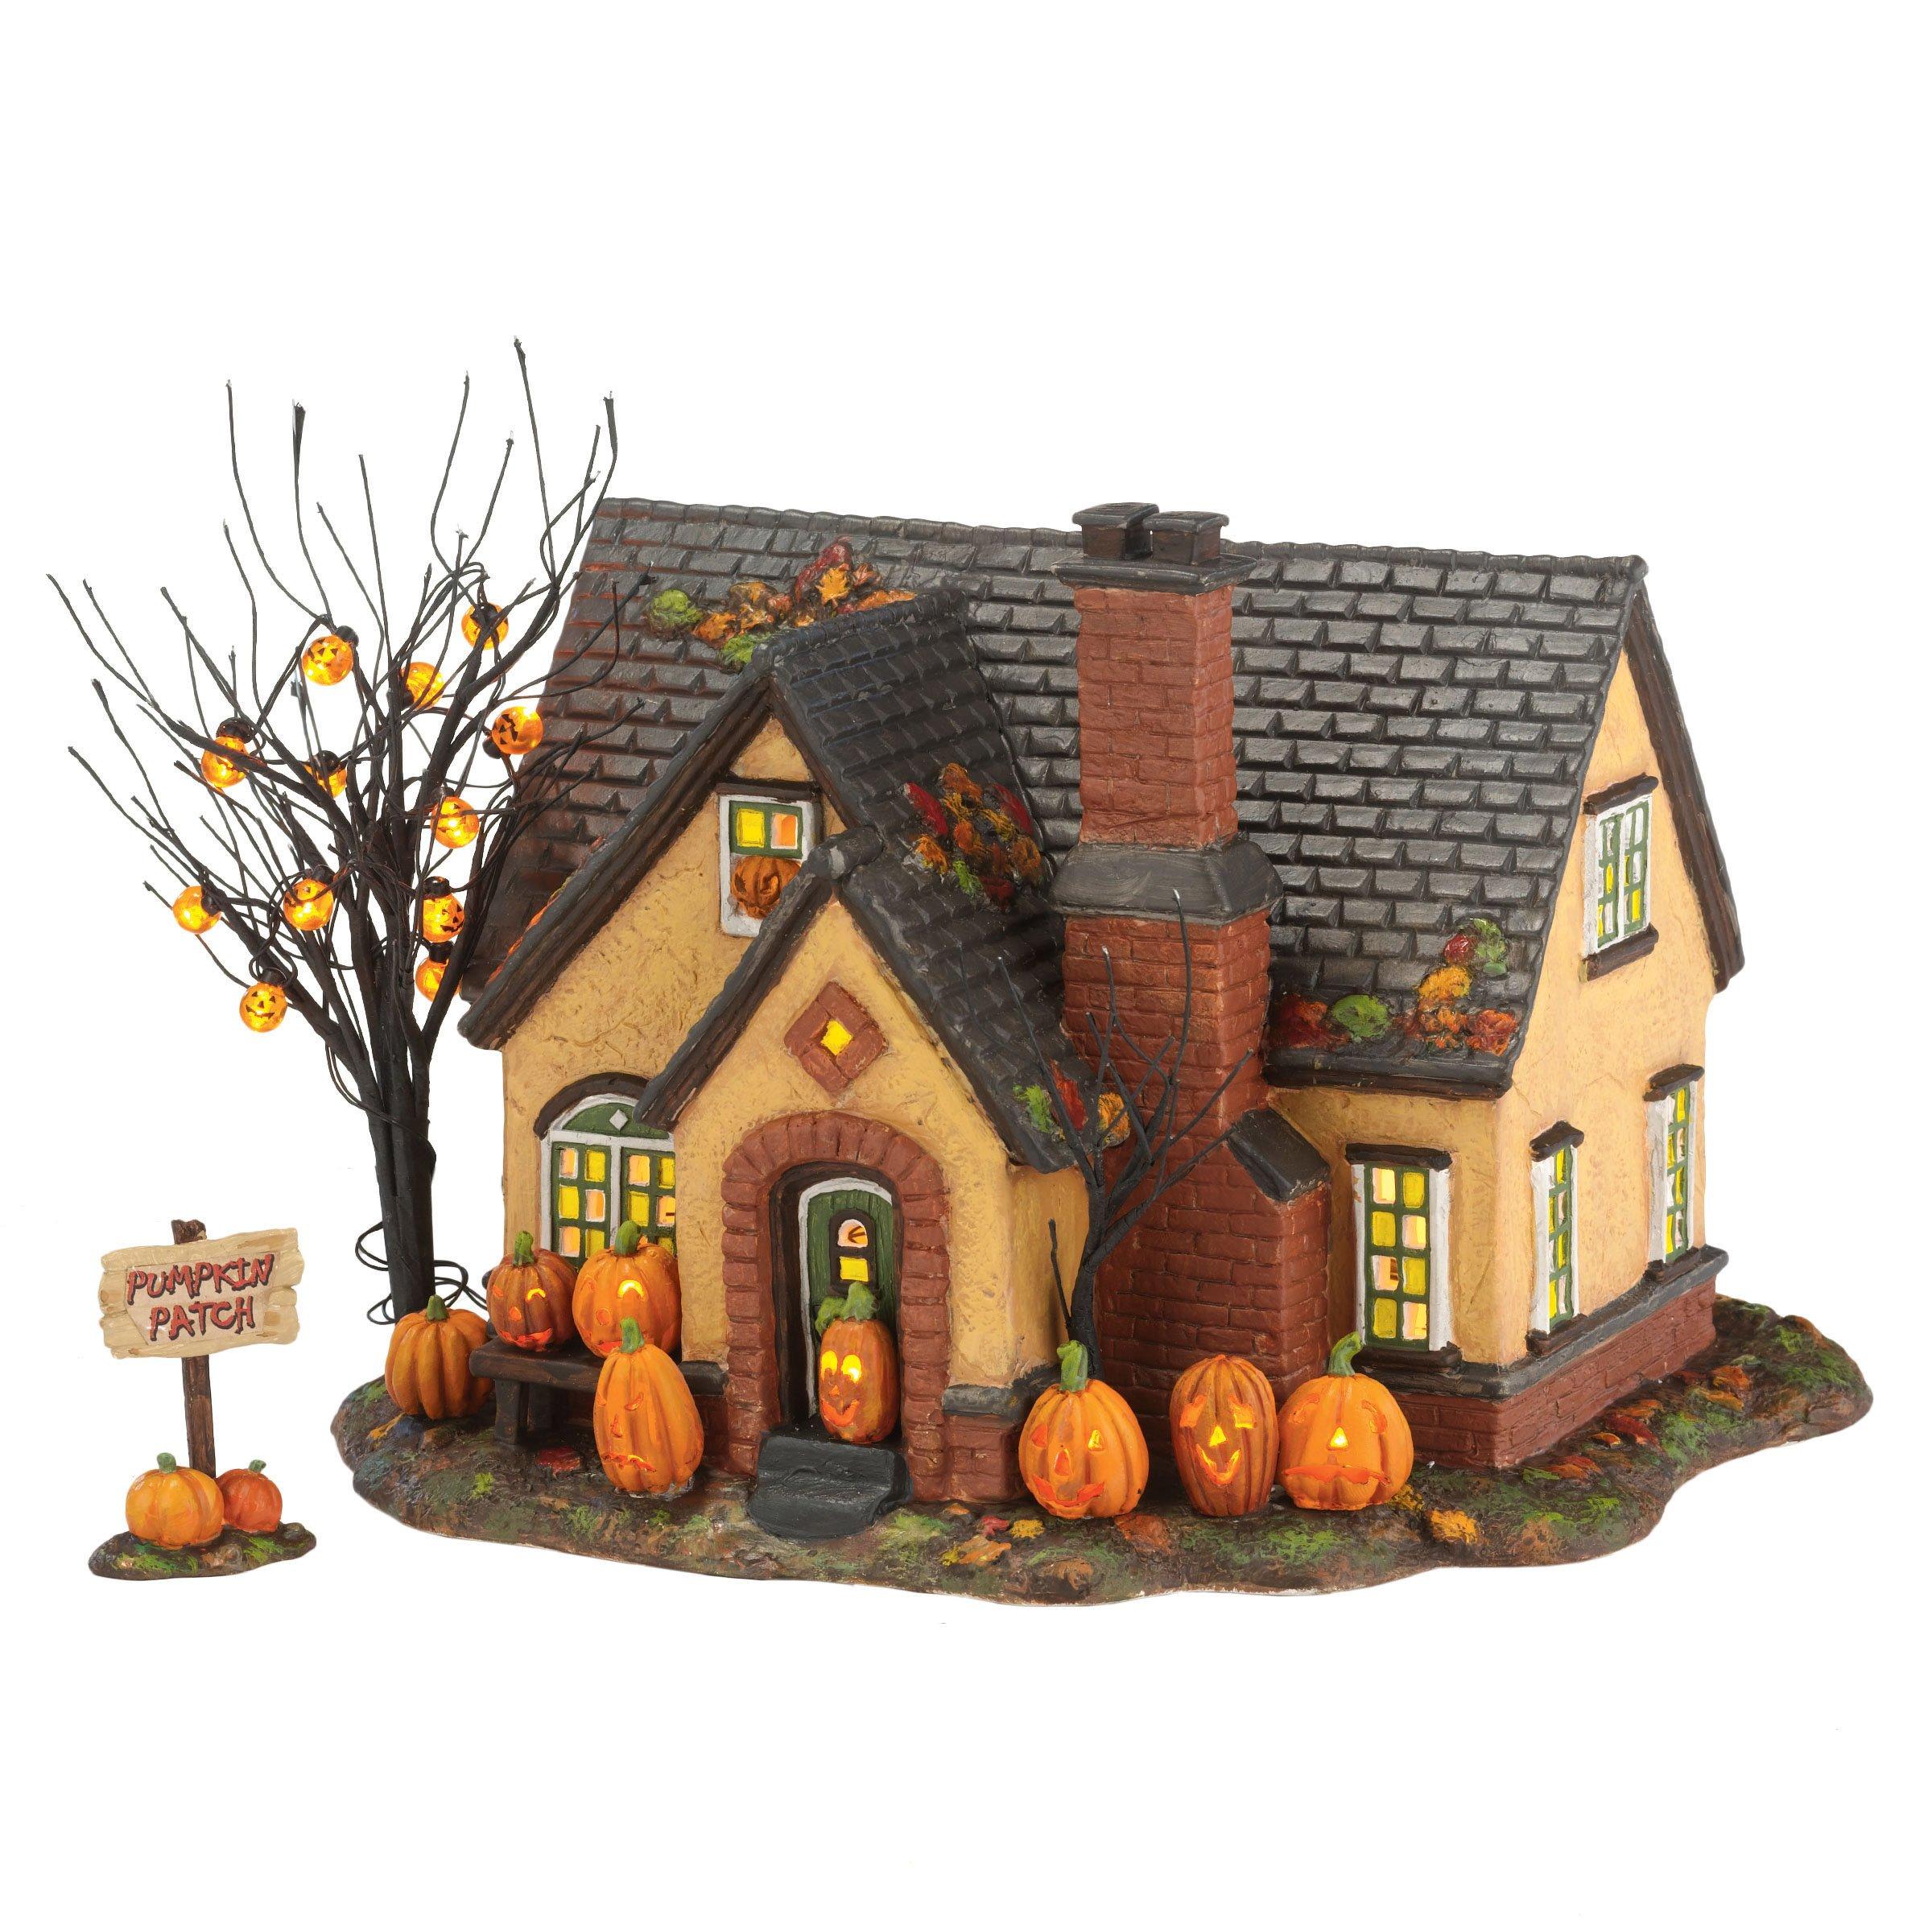 Department 56 Snow Village Halloween Pumpkin House Lit Building, 6.69 inch (4030757) by Department 56